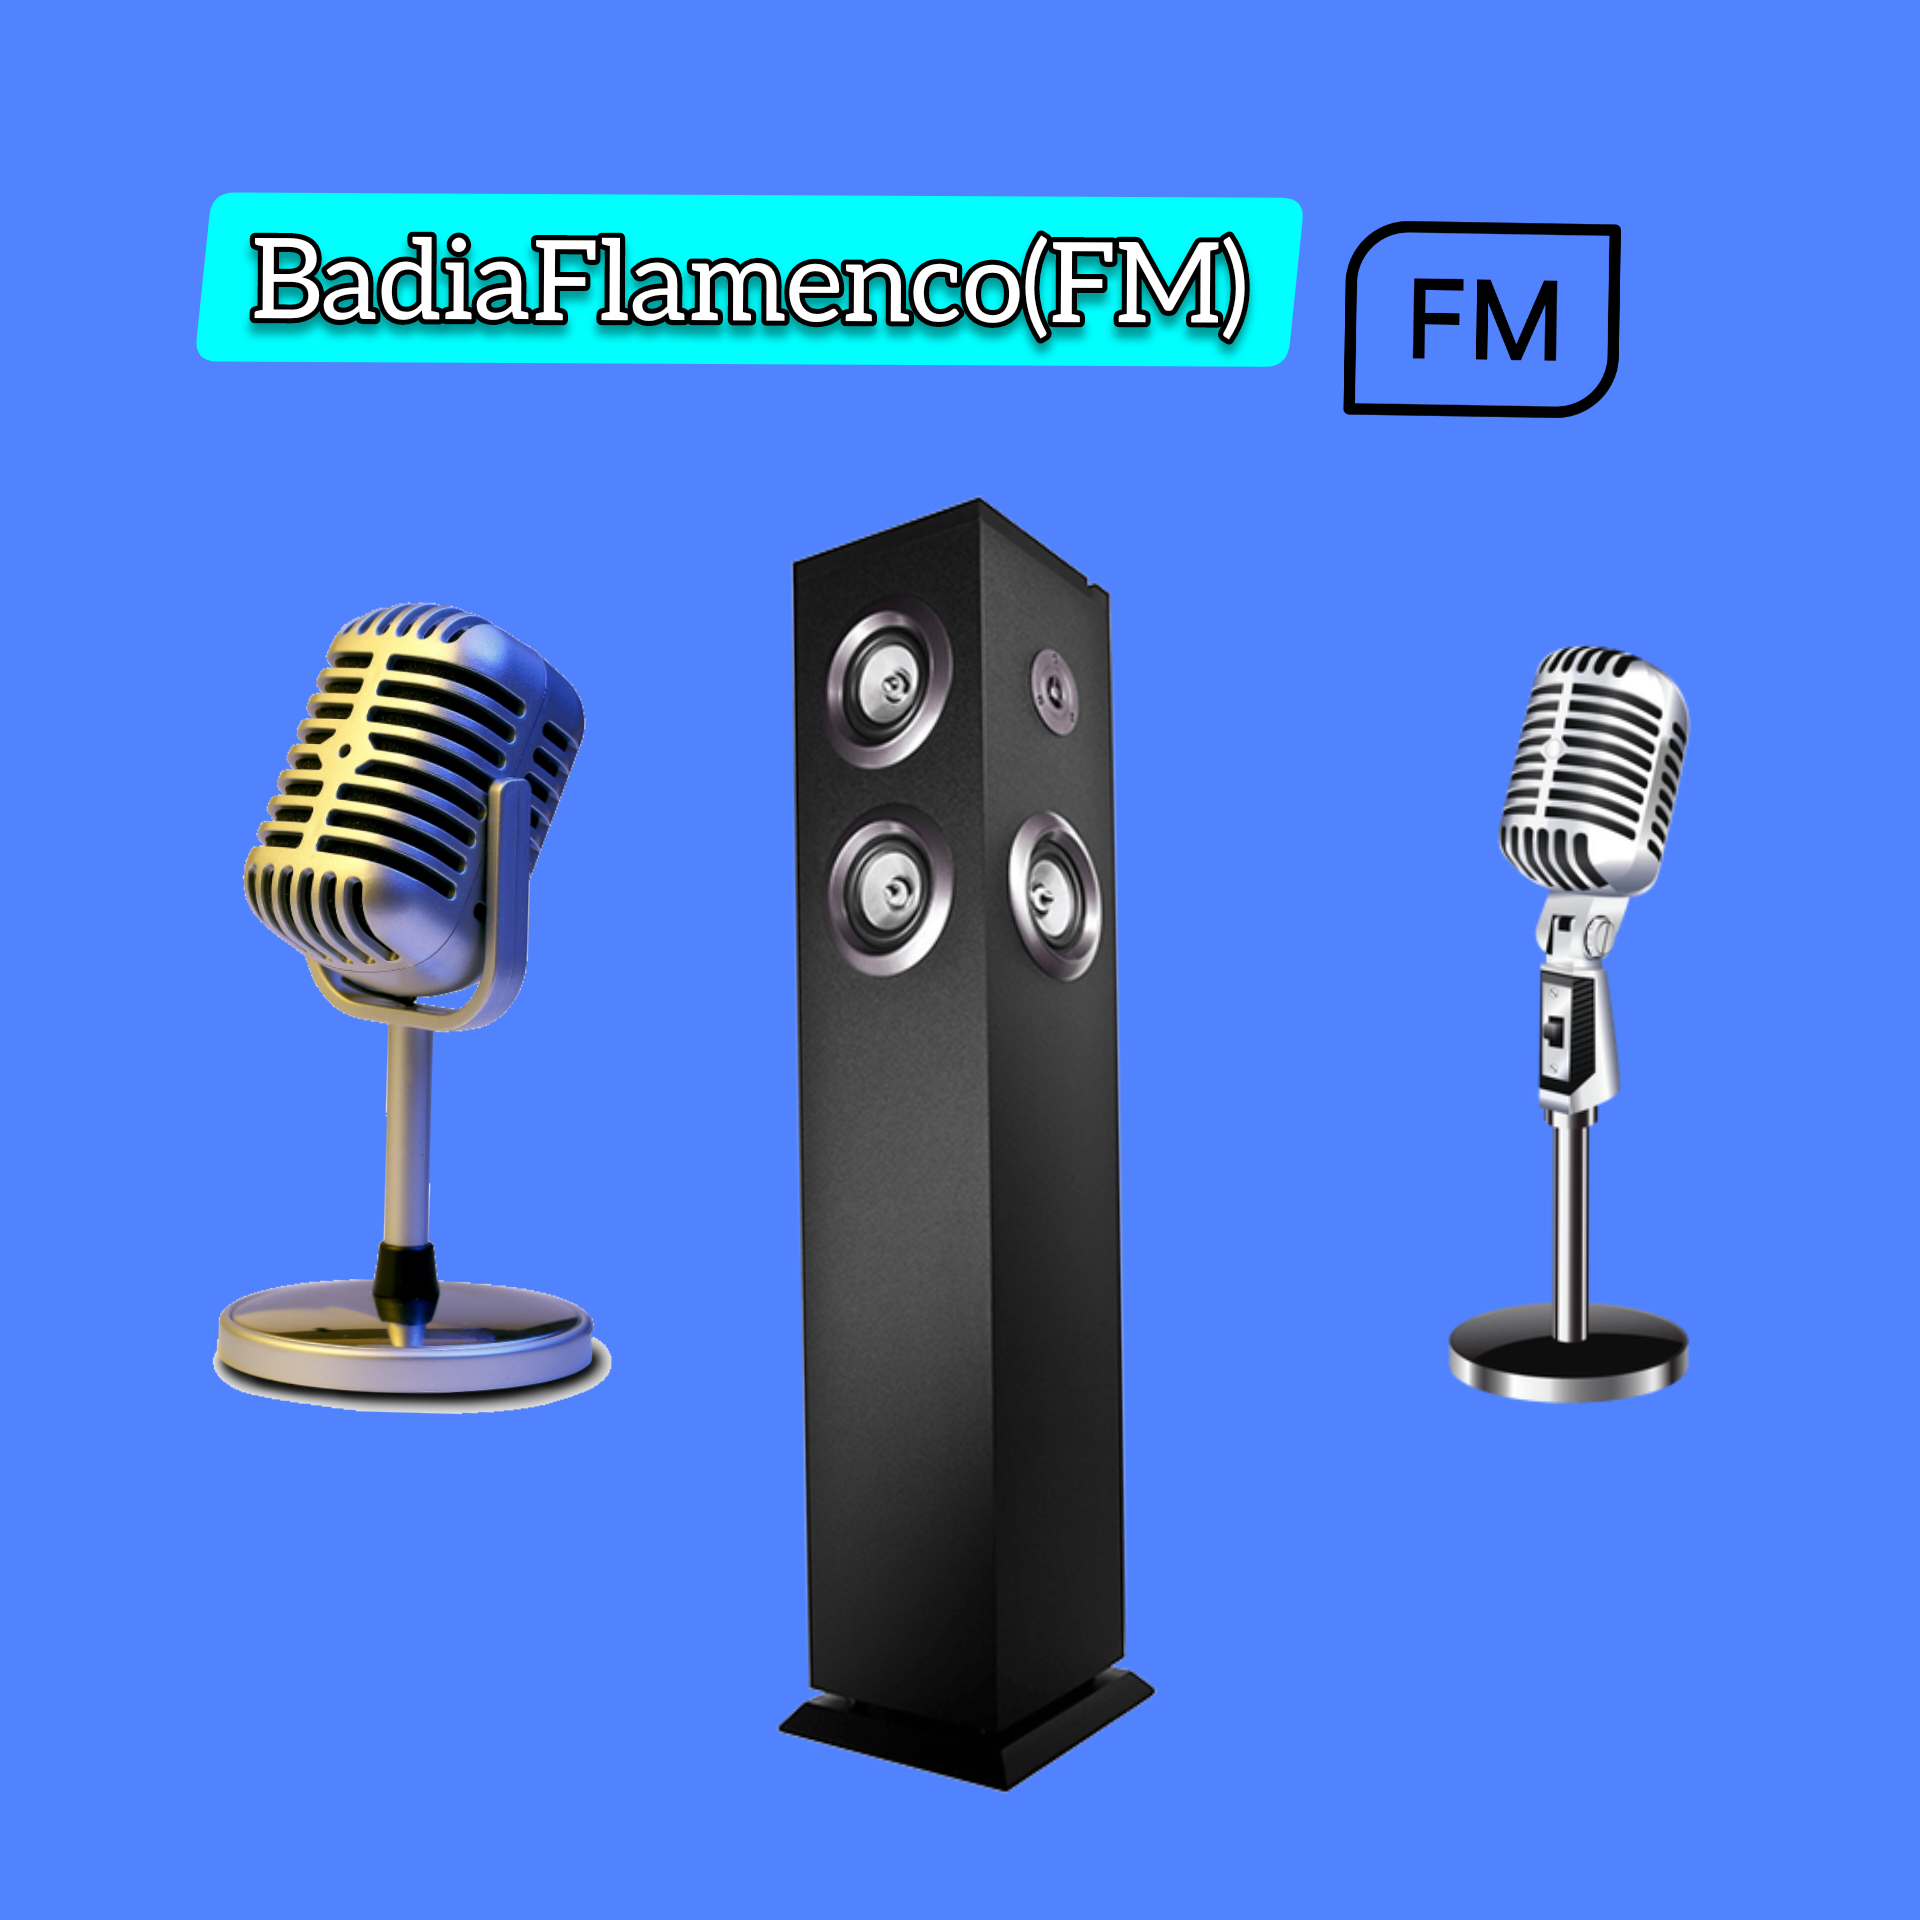 BadiaFlamencoFM